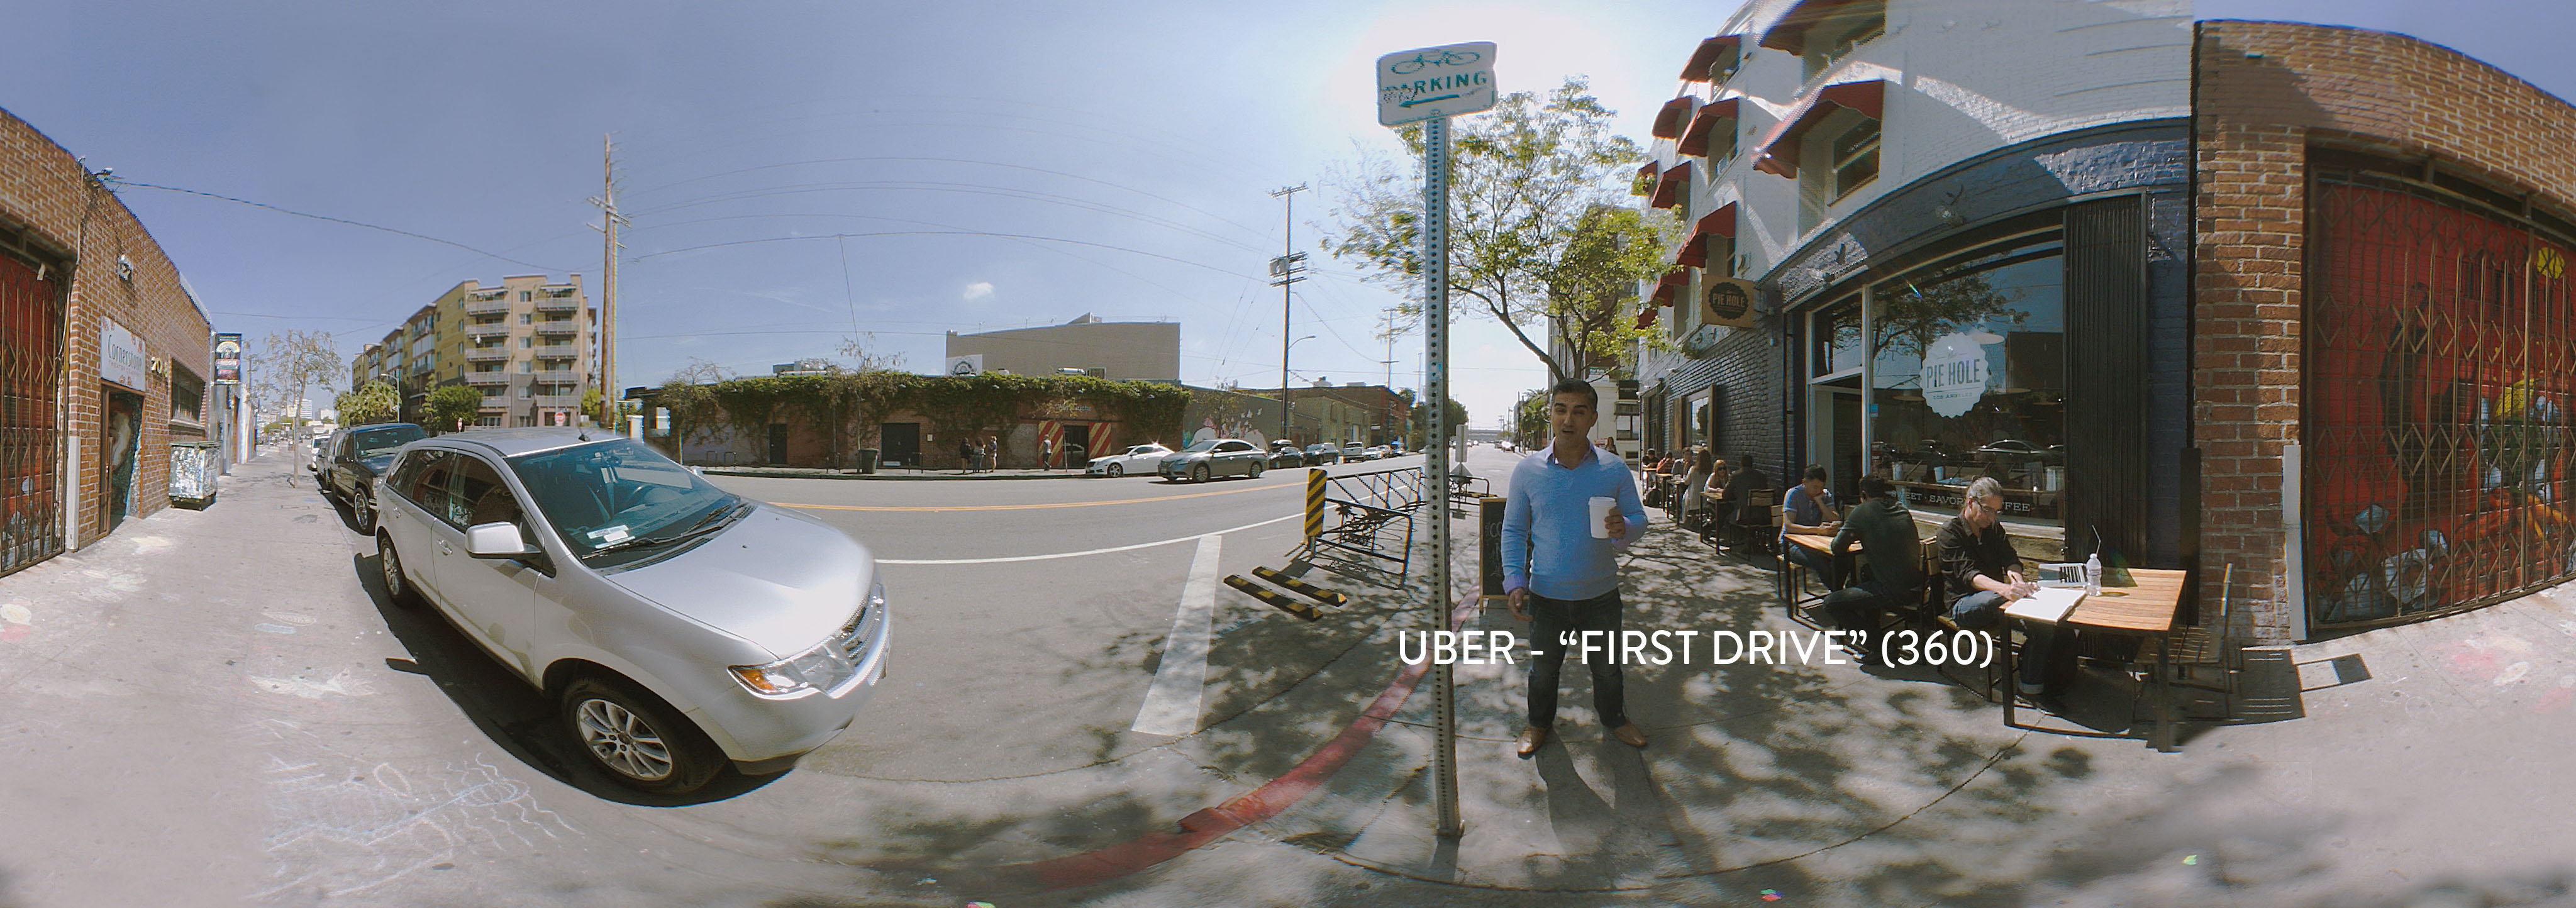 "DQ_Splash__0007_UBER - ""FIRST DRIVE"" (360)"